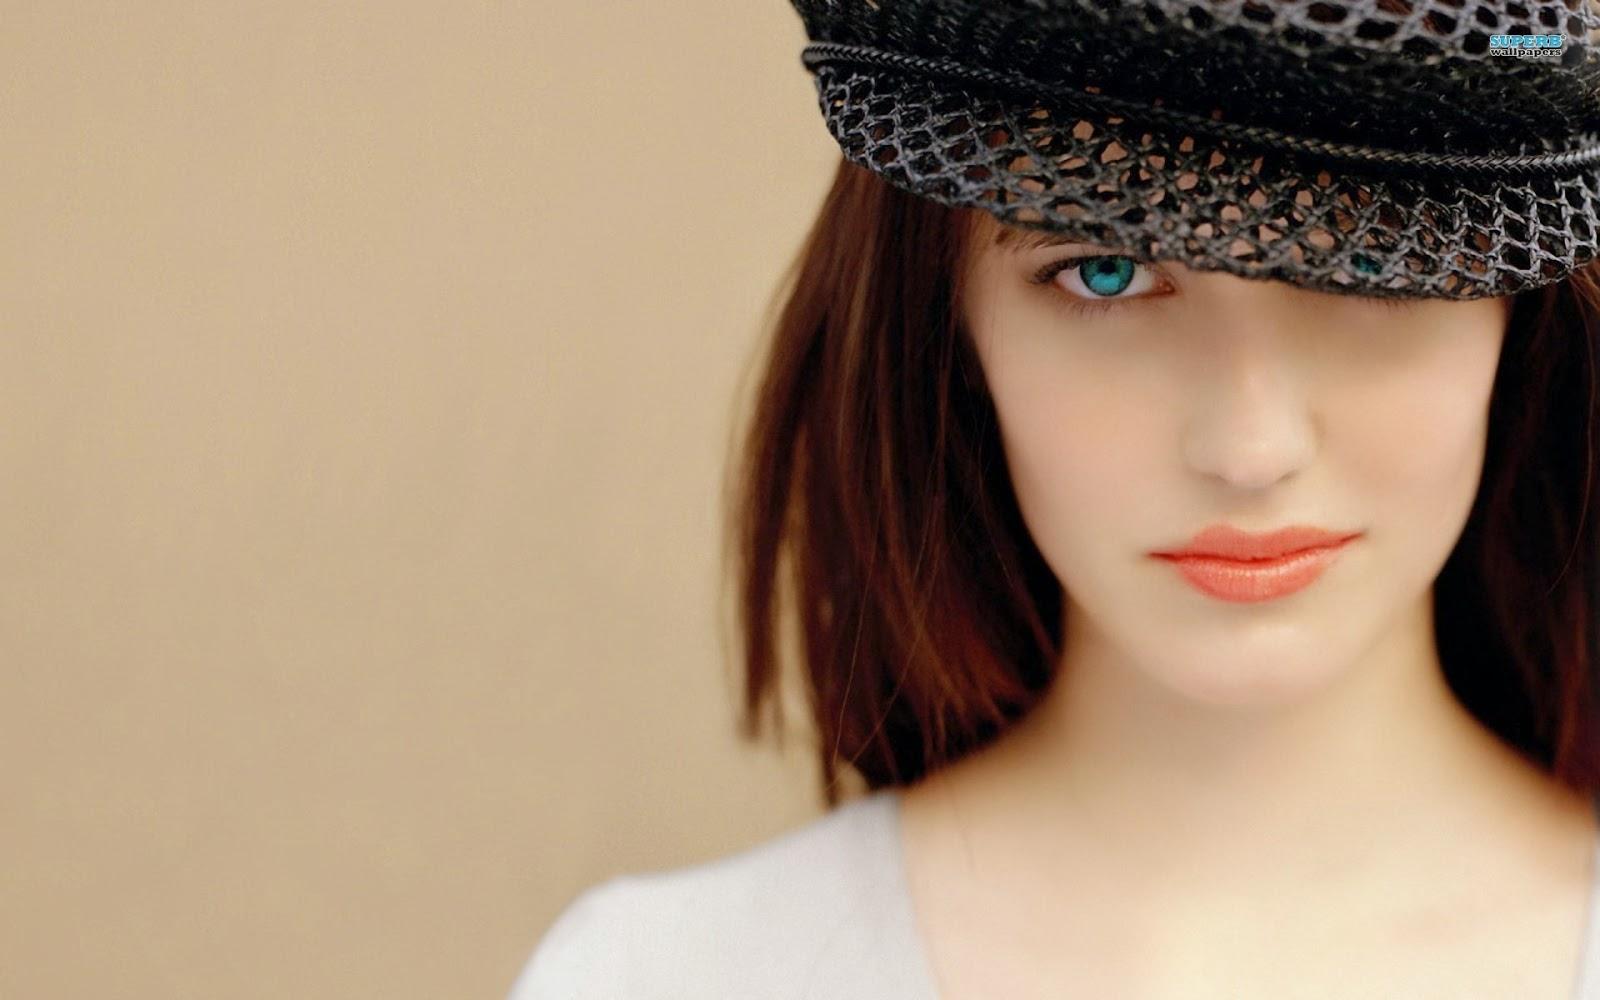 Hollywood actress hot hd wallpapers beautiful hollywood actress wallpapers hollywood girls - Hollywood actress full hd wallpaper ...